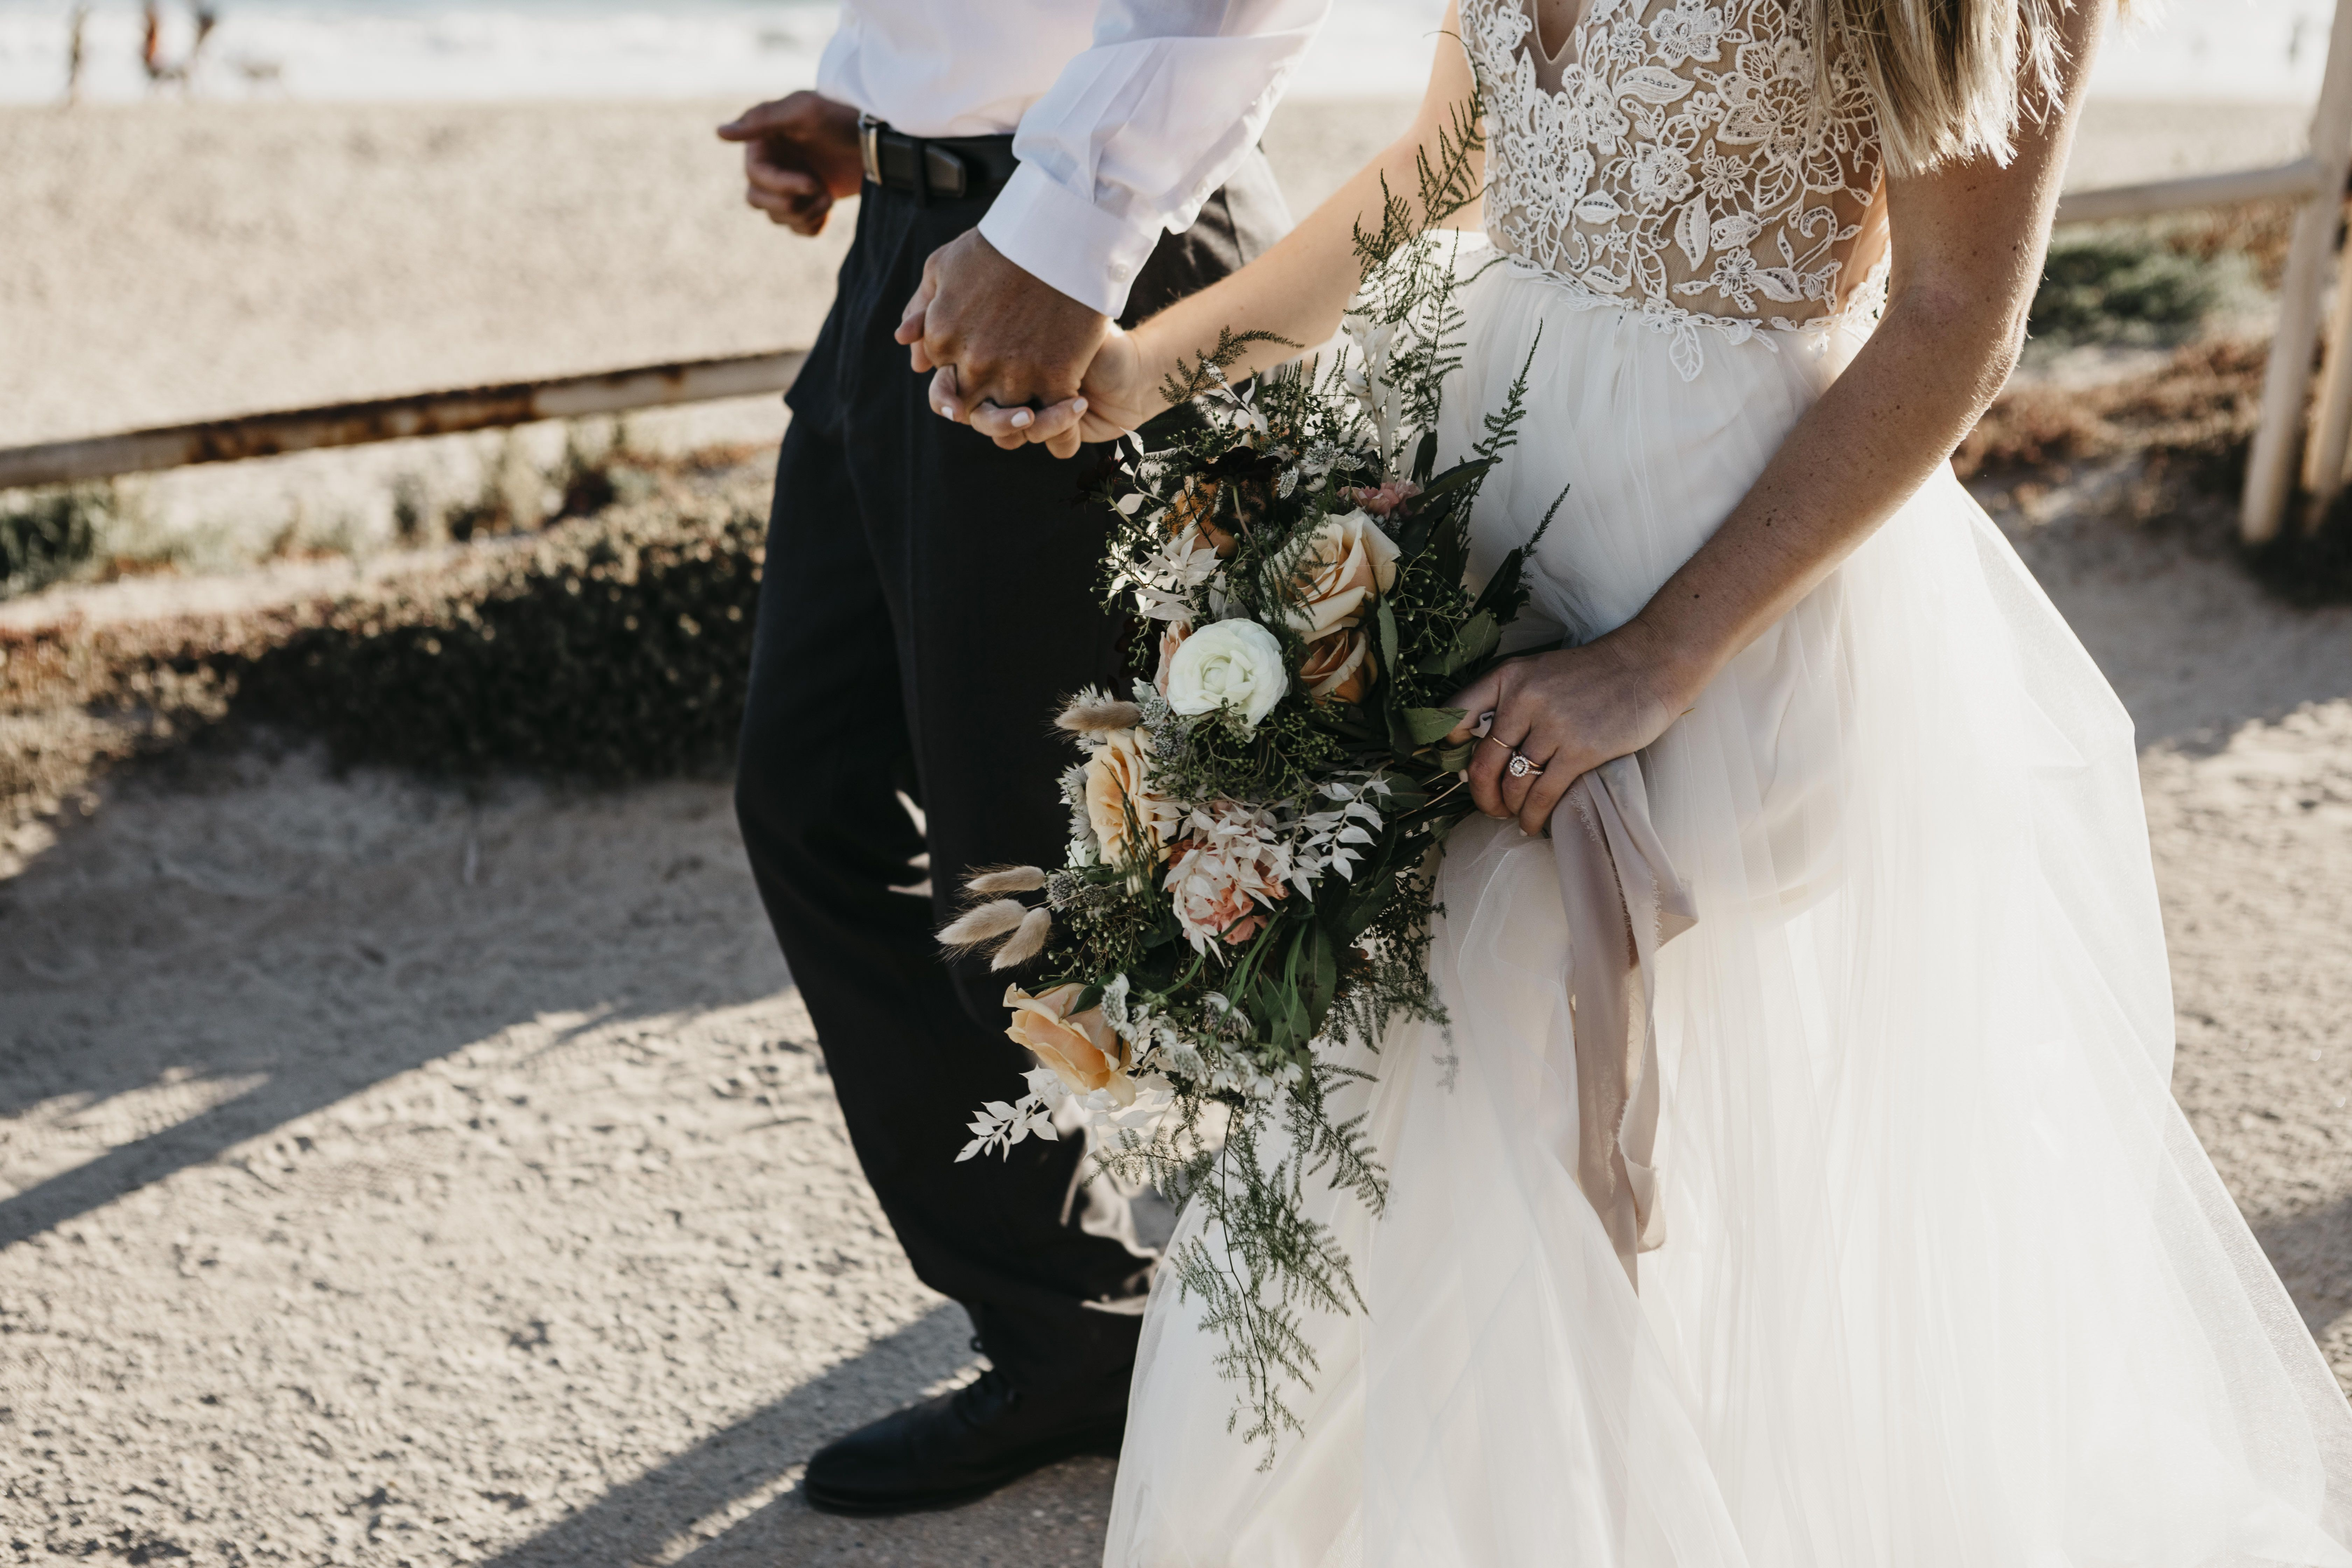 5 Cheap Wedding Venue Ideas